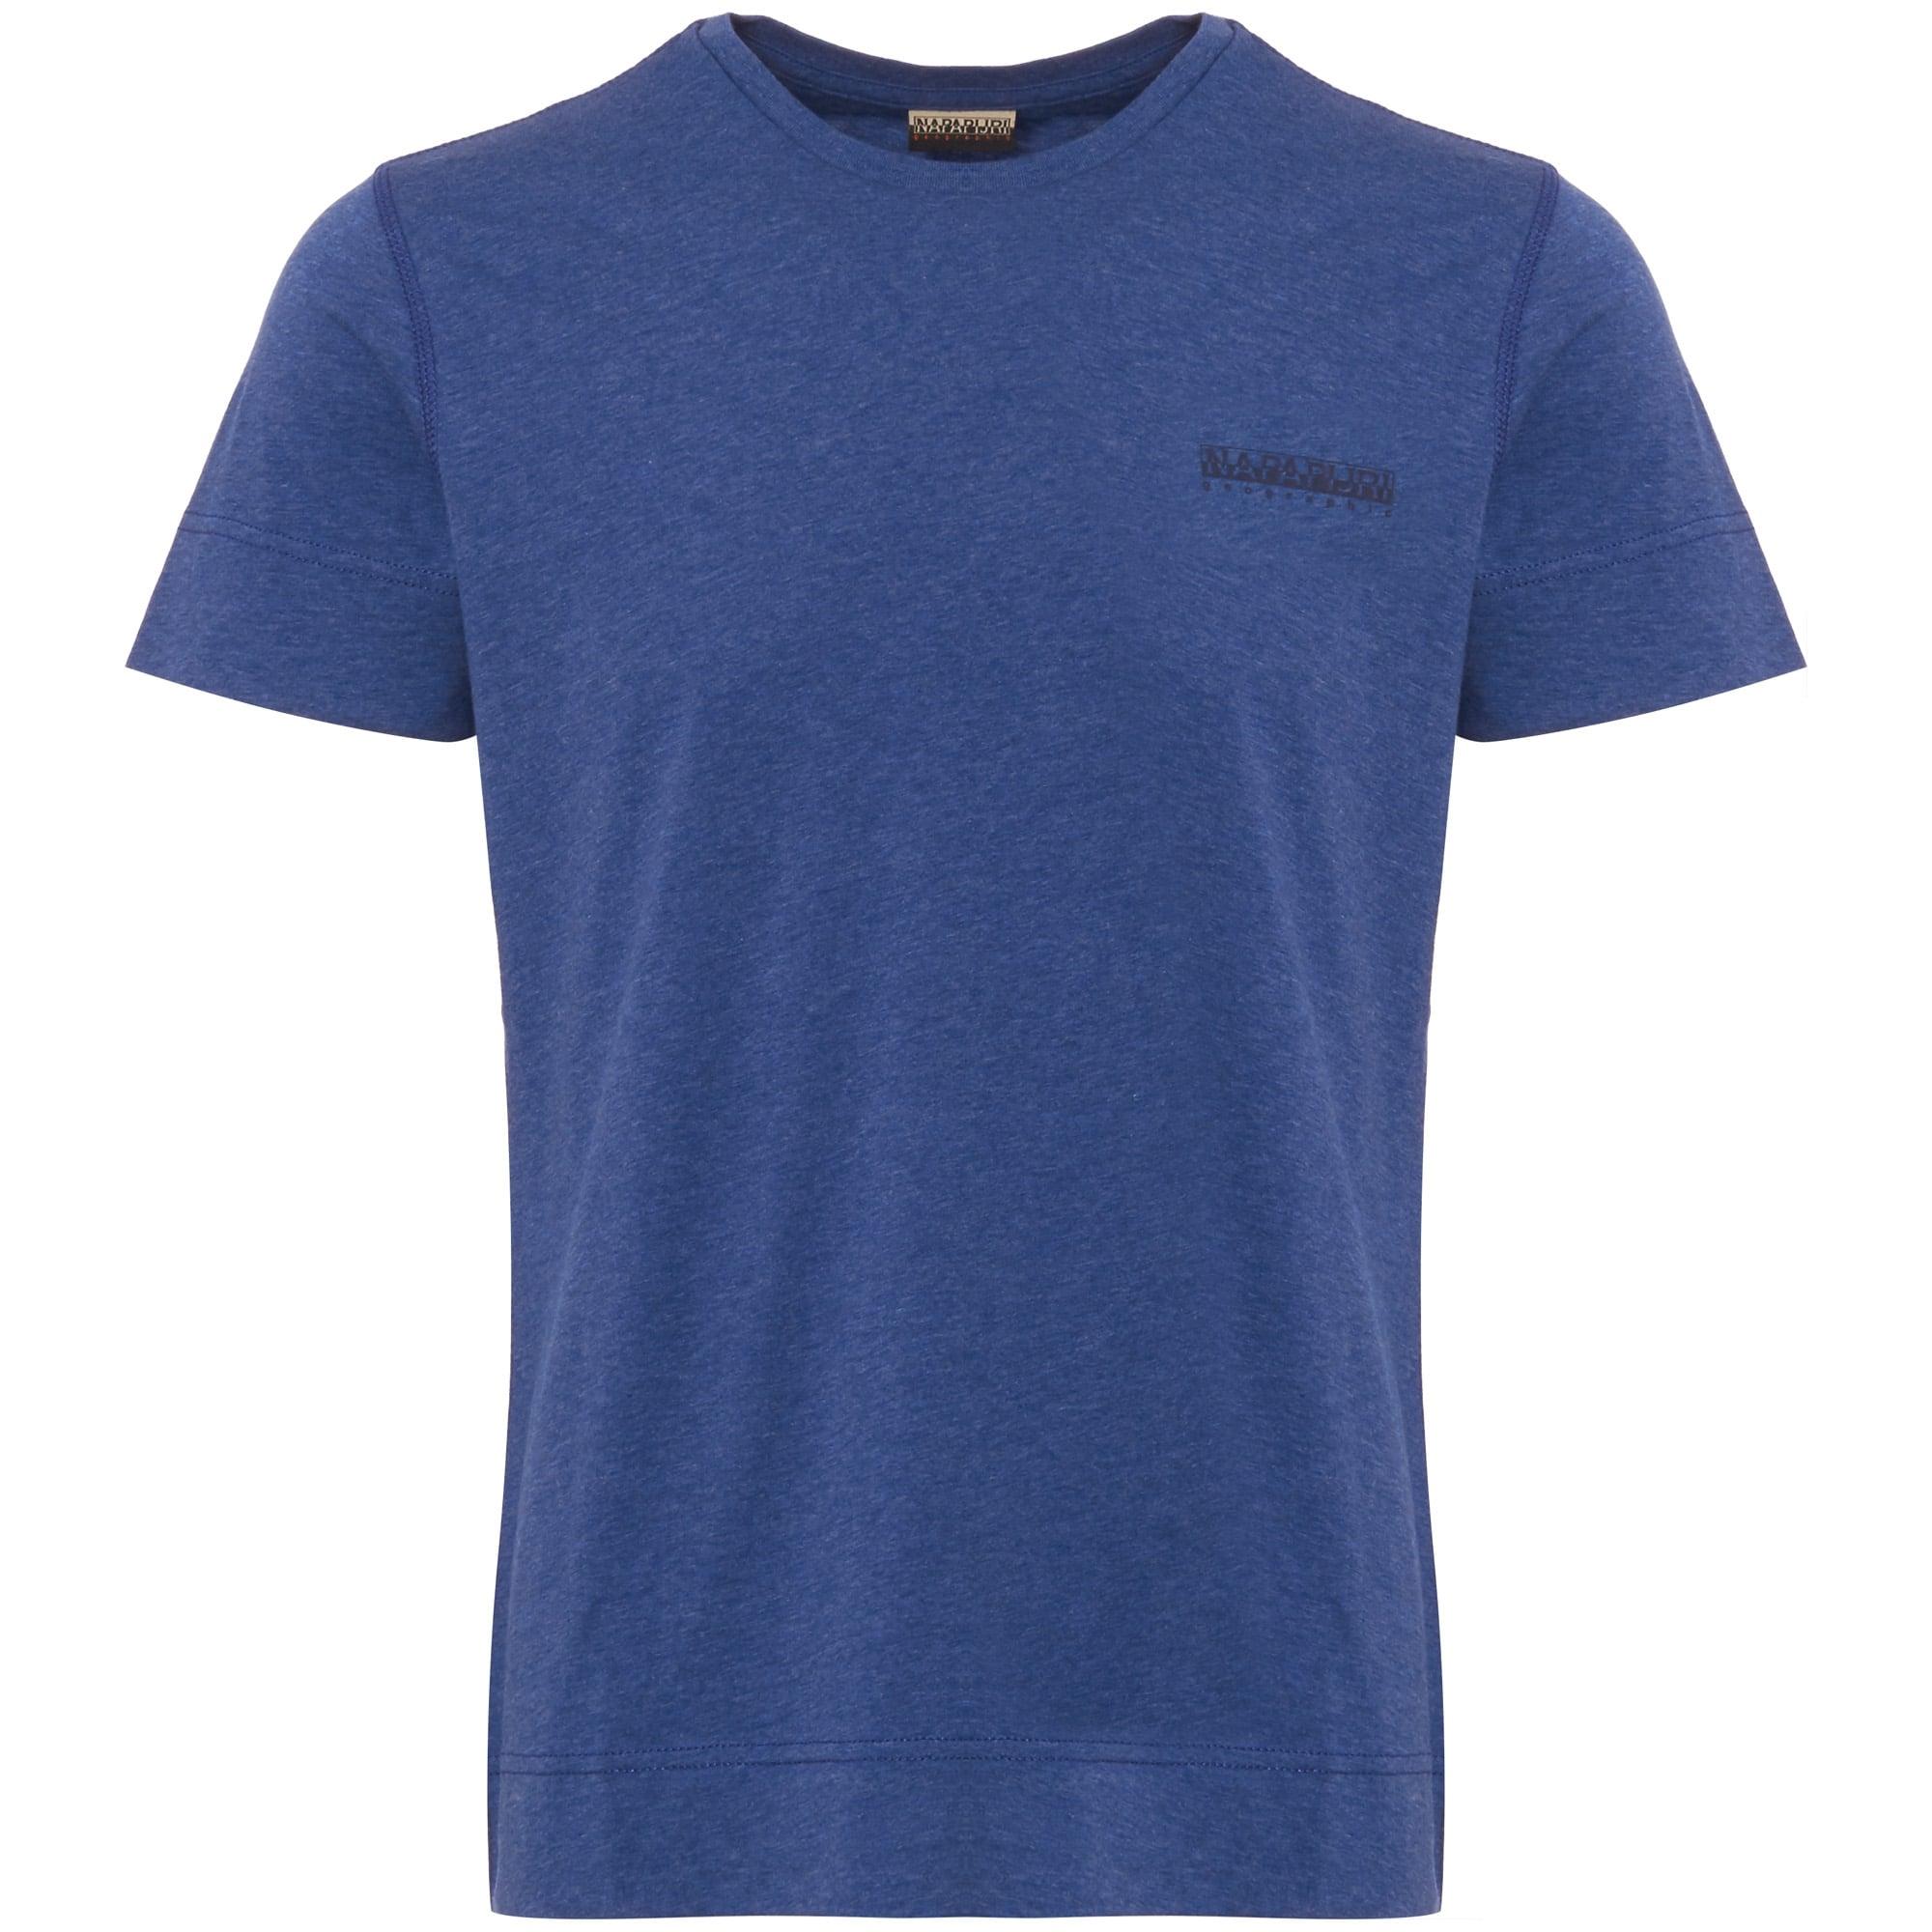 Image of Blue Depth She T-shirt